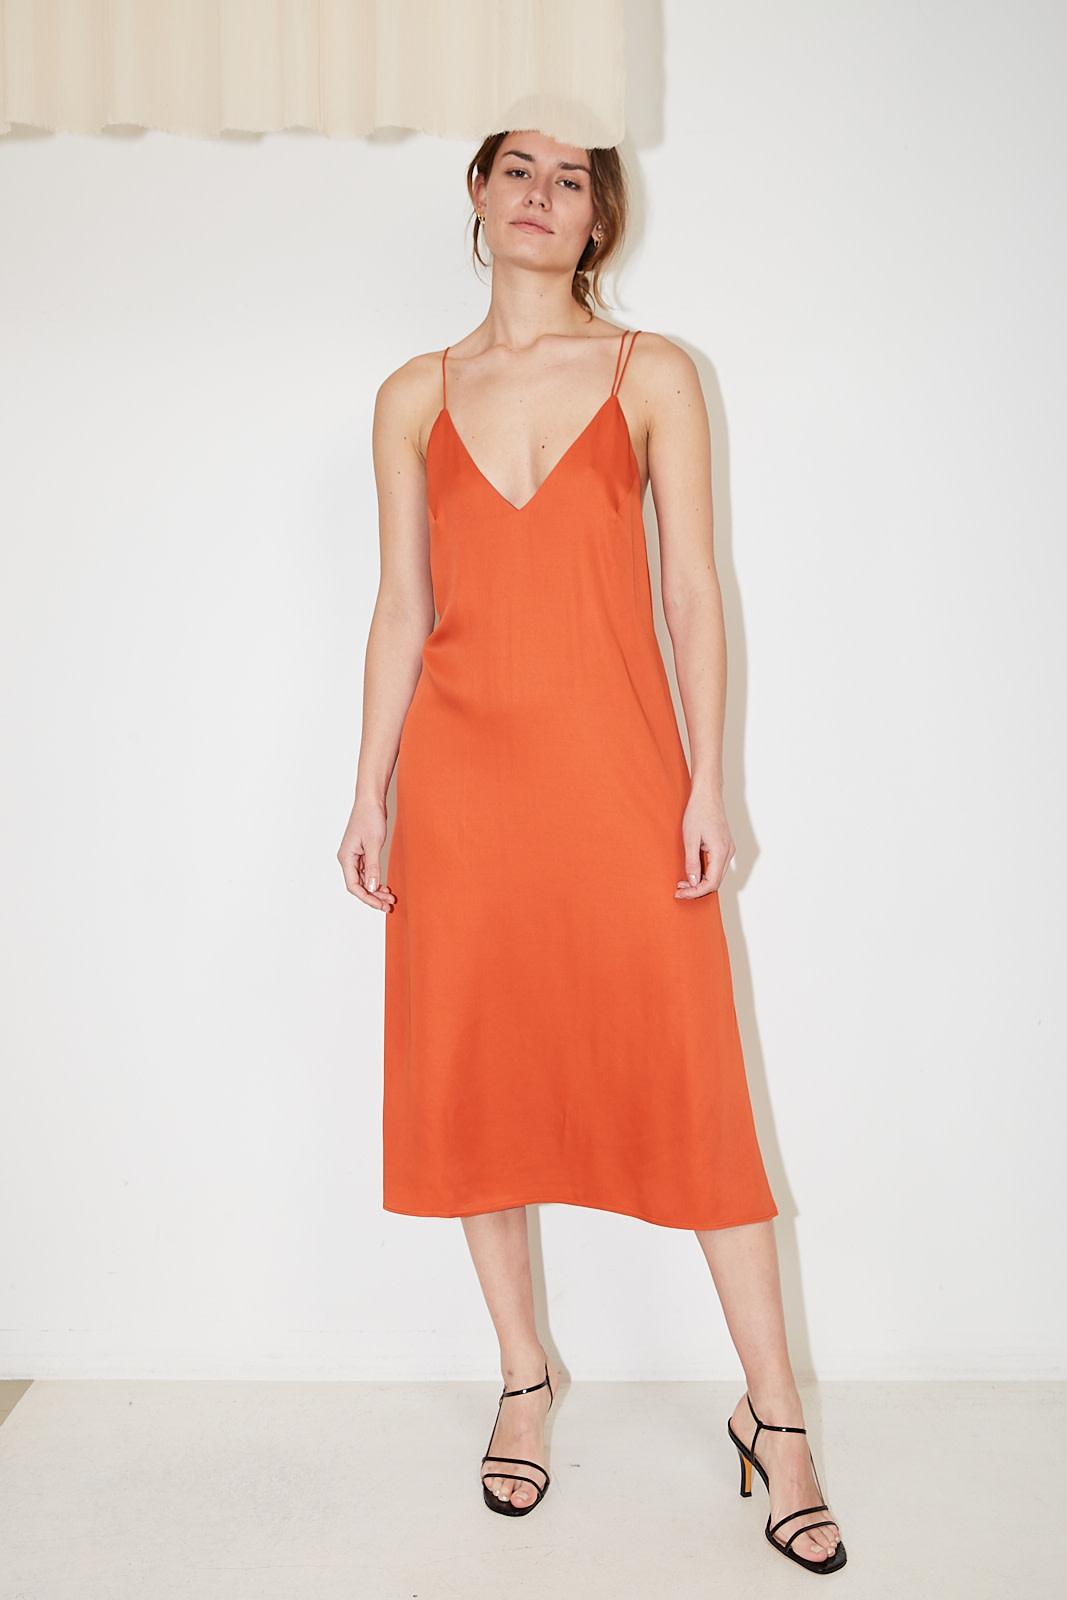 Aeron Giselle recycled satin dress